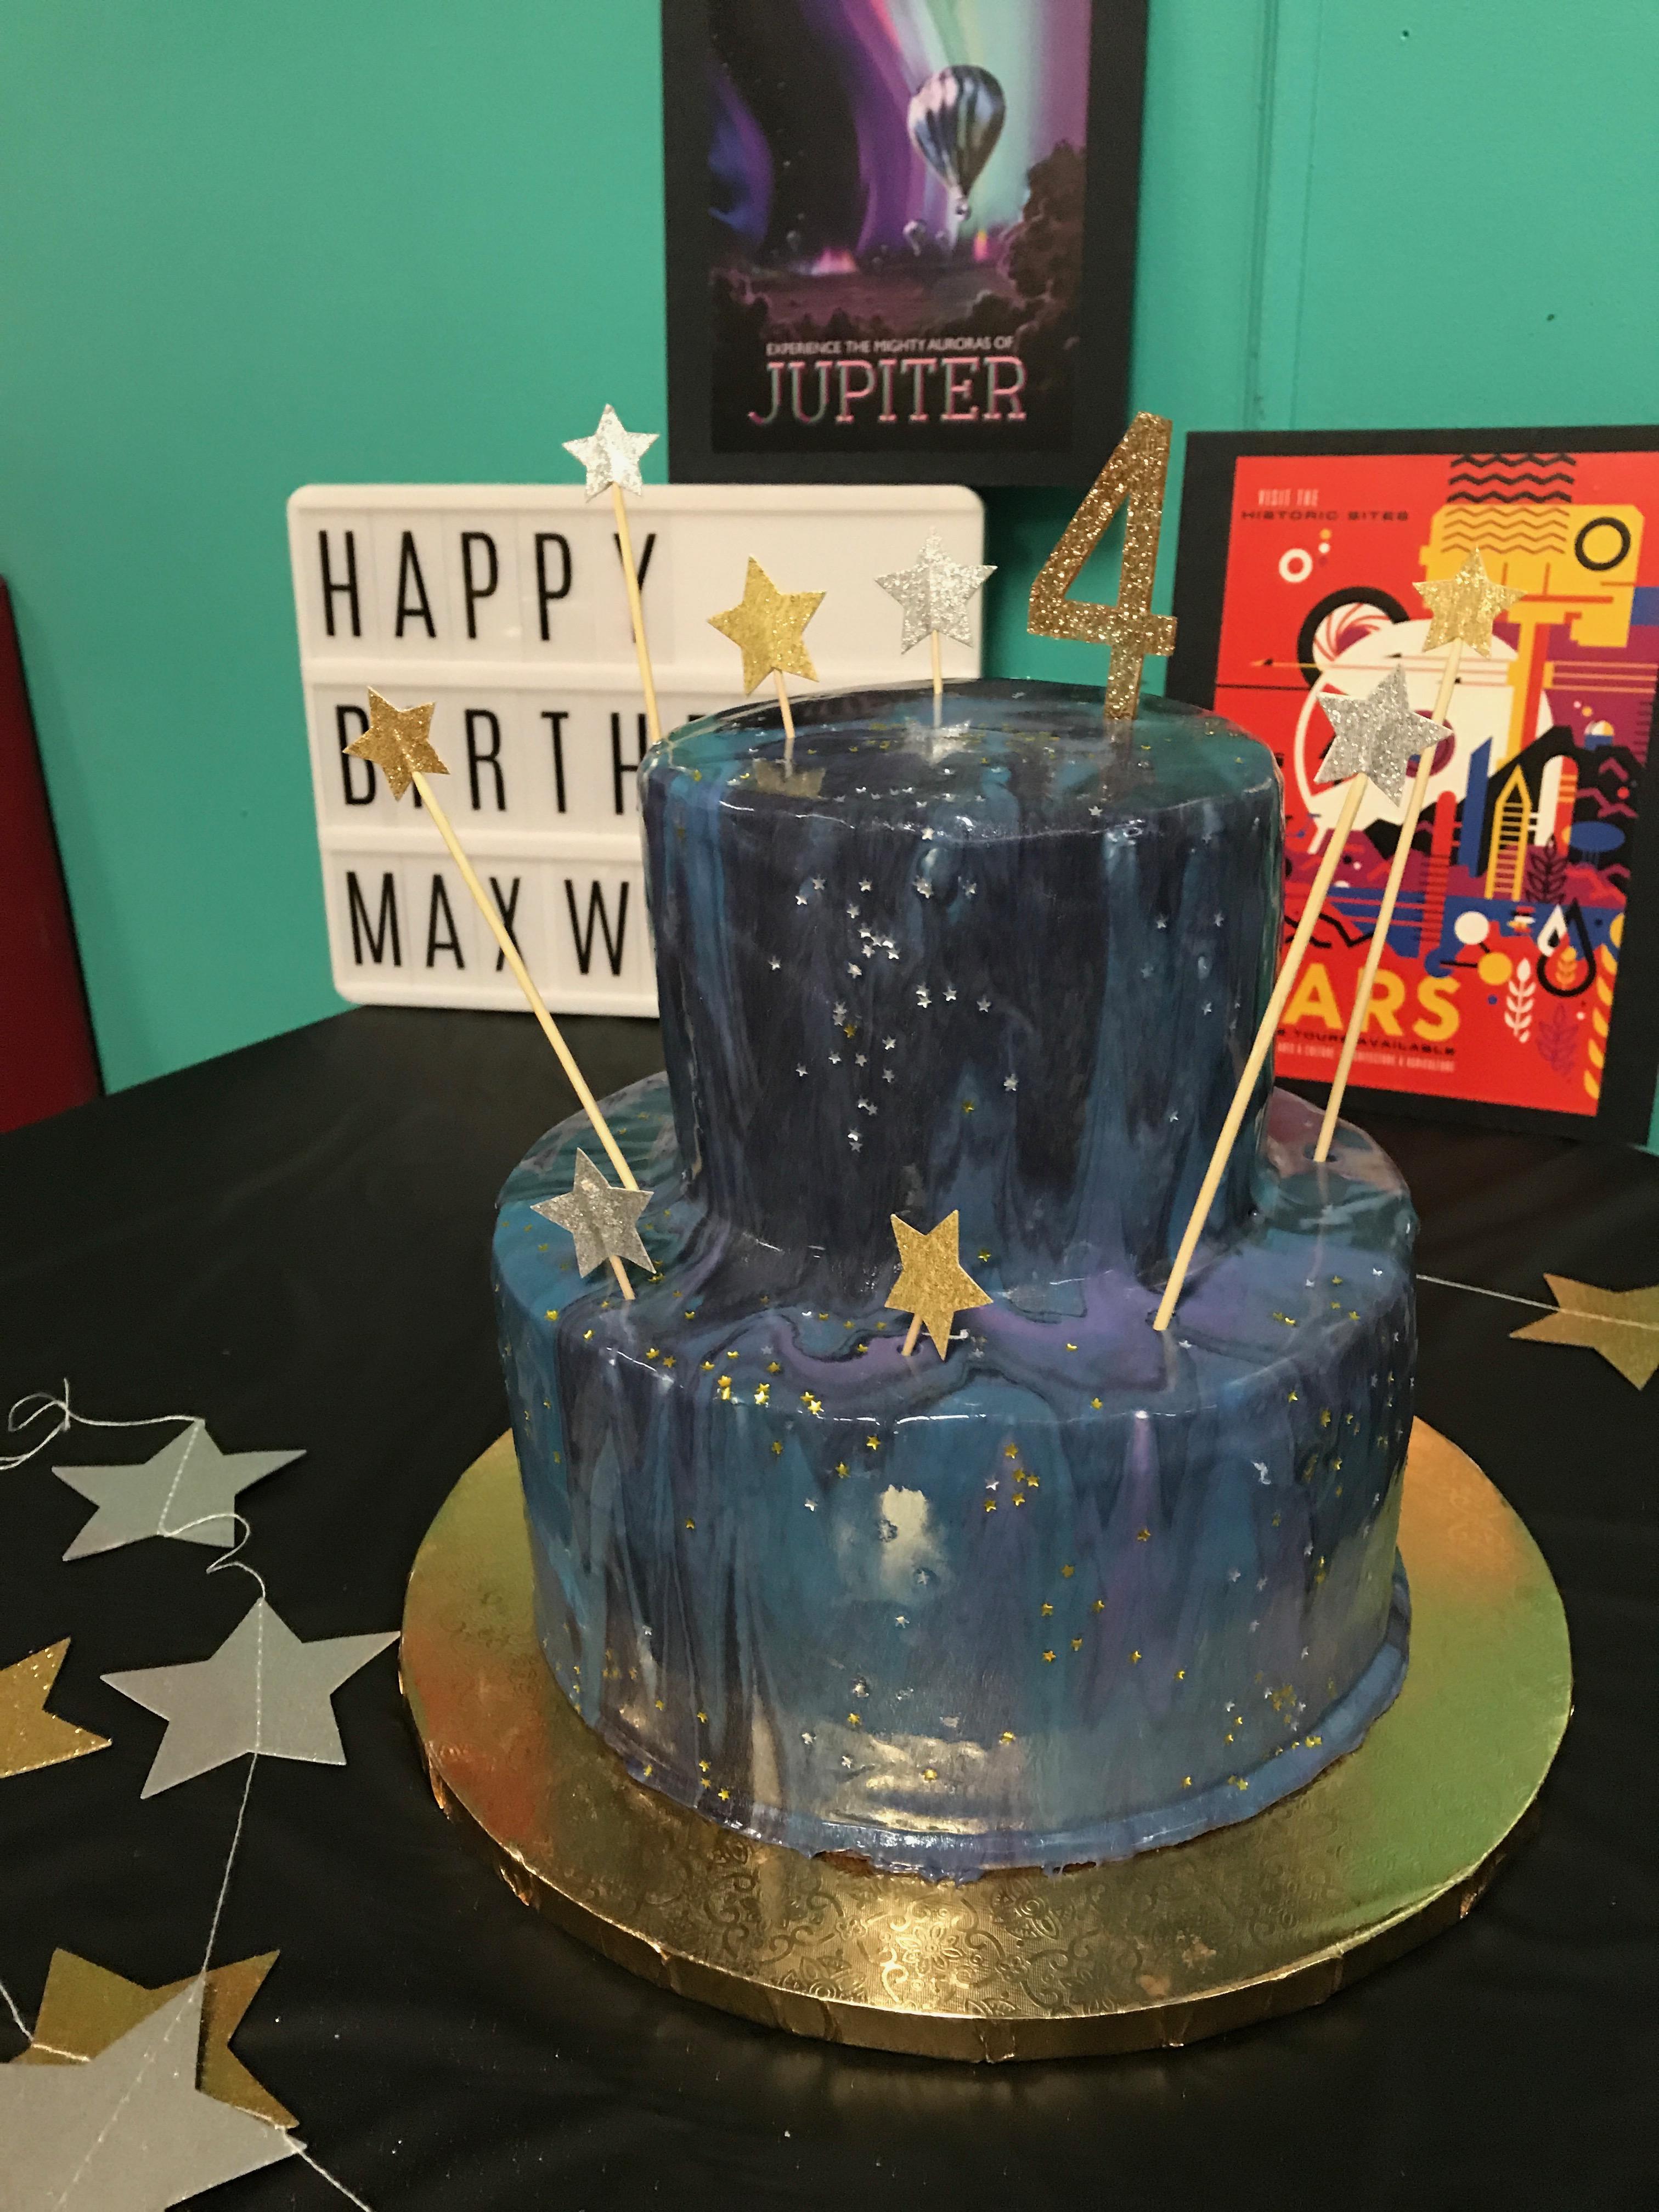 Trendy Birthday Cakes from Instagram | Galaxy Cake